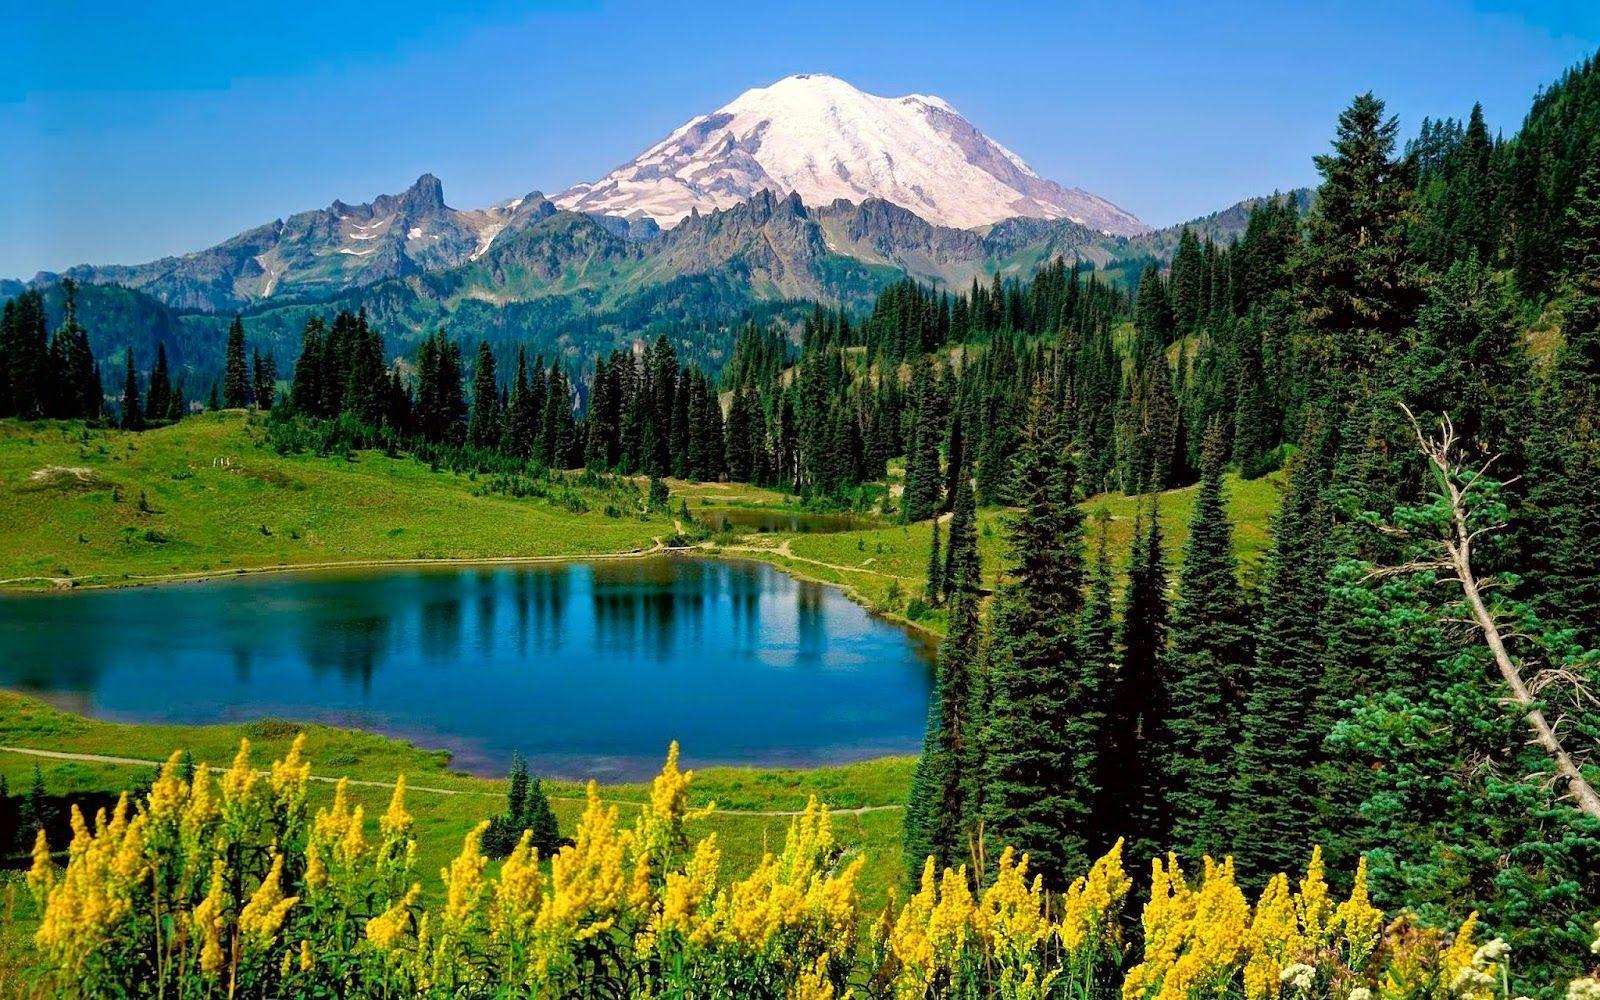 Top Wallpaper Mountain Windows 7 - a9c8fb698d8c6e6f75cd661b1eea6b34  Snapshot_486535.jpg